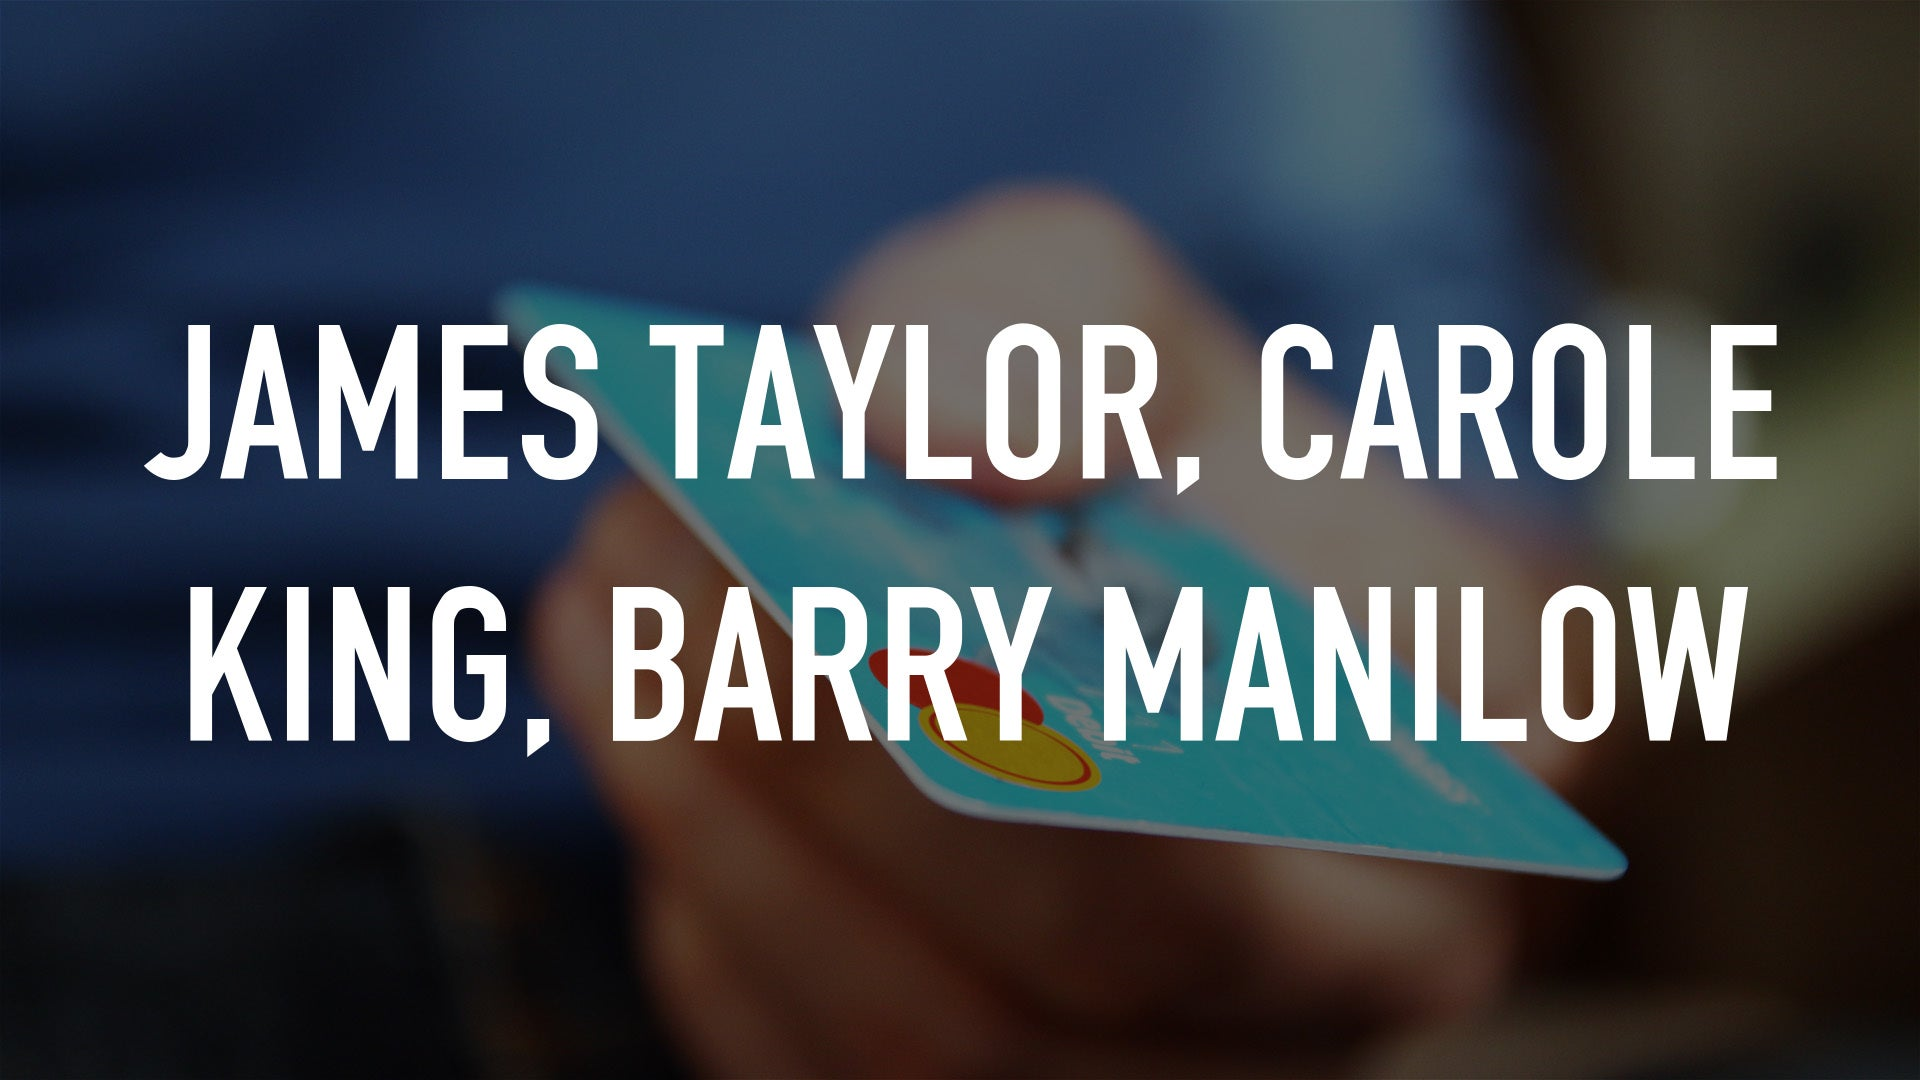 James Taylor, Carole King, Barry Manilow